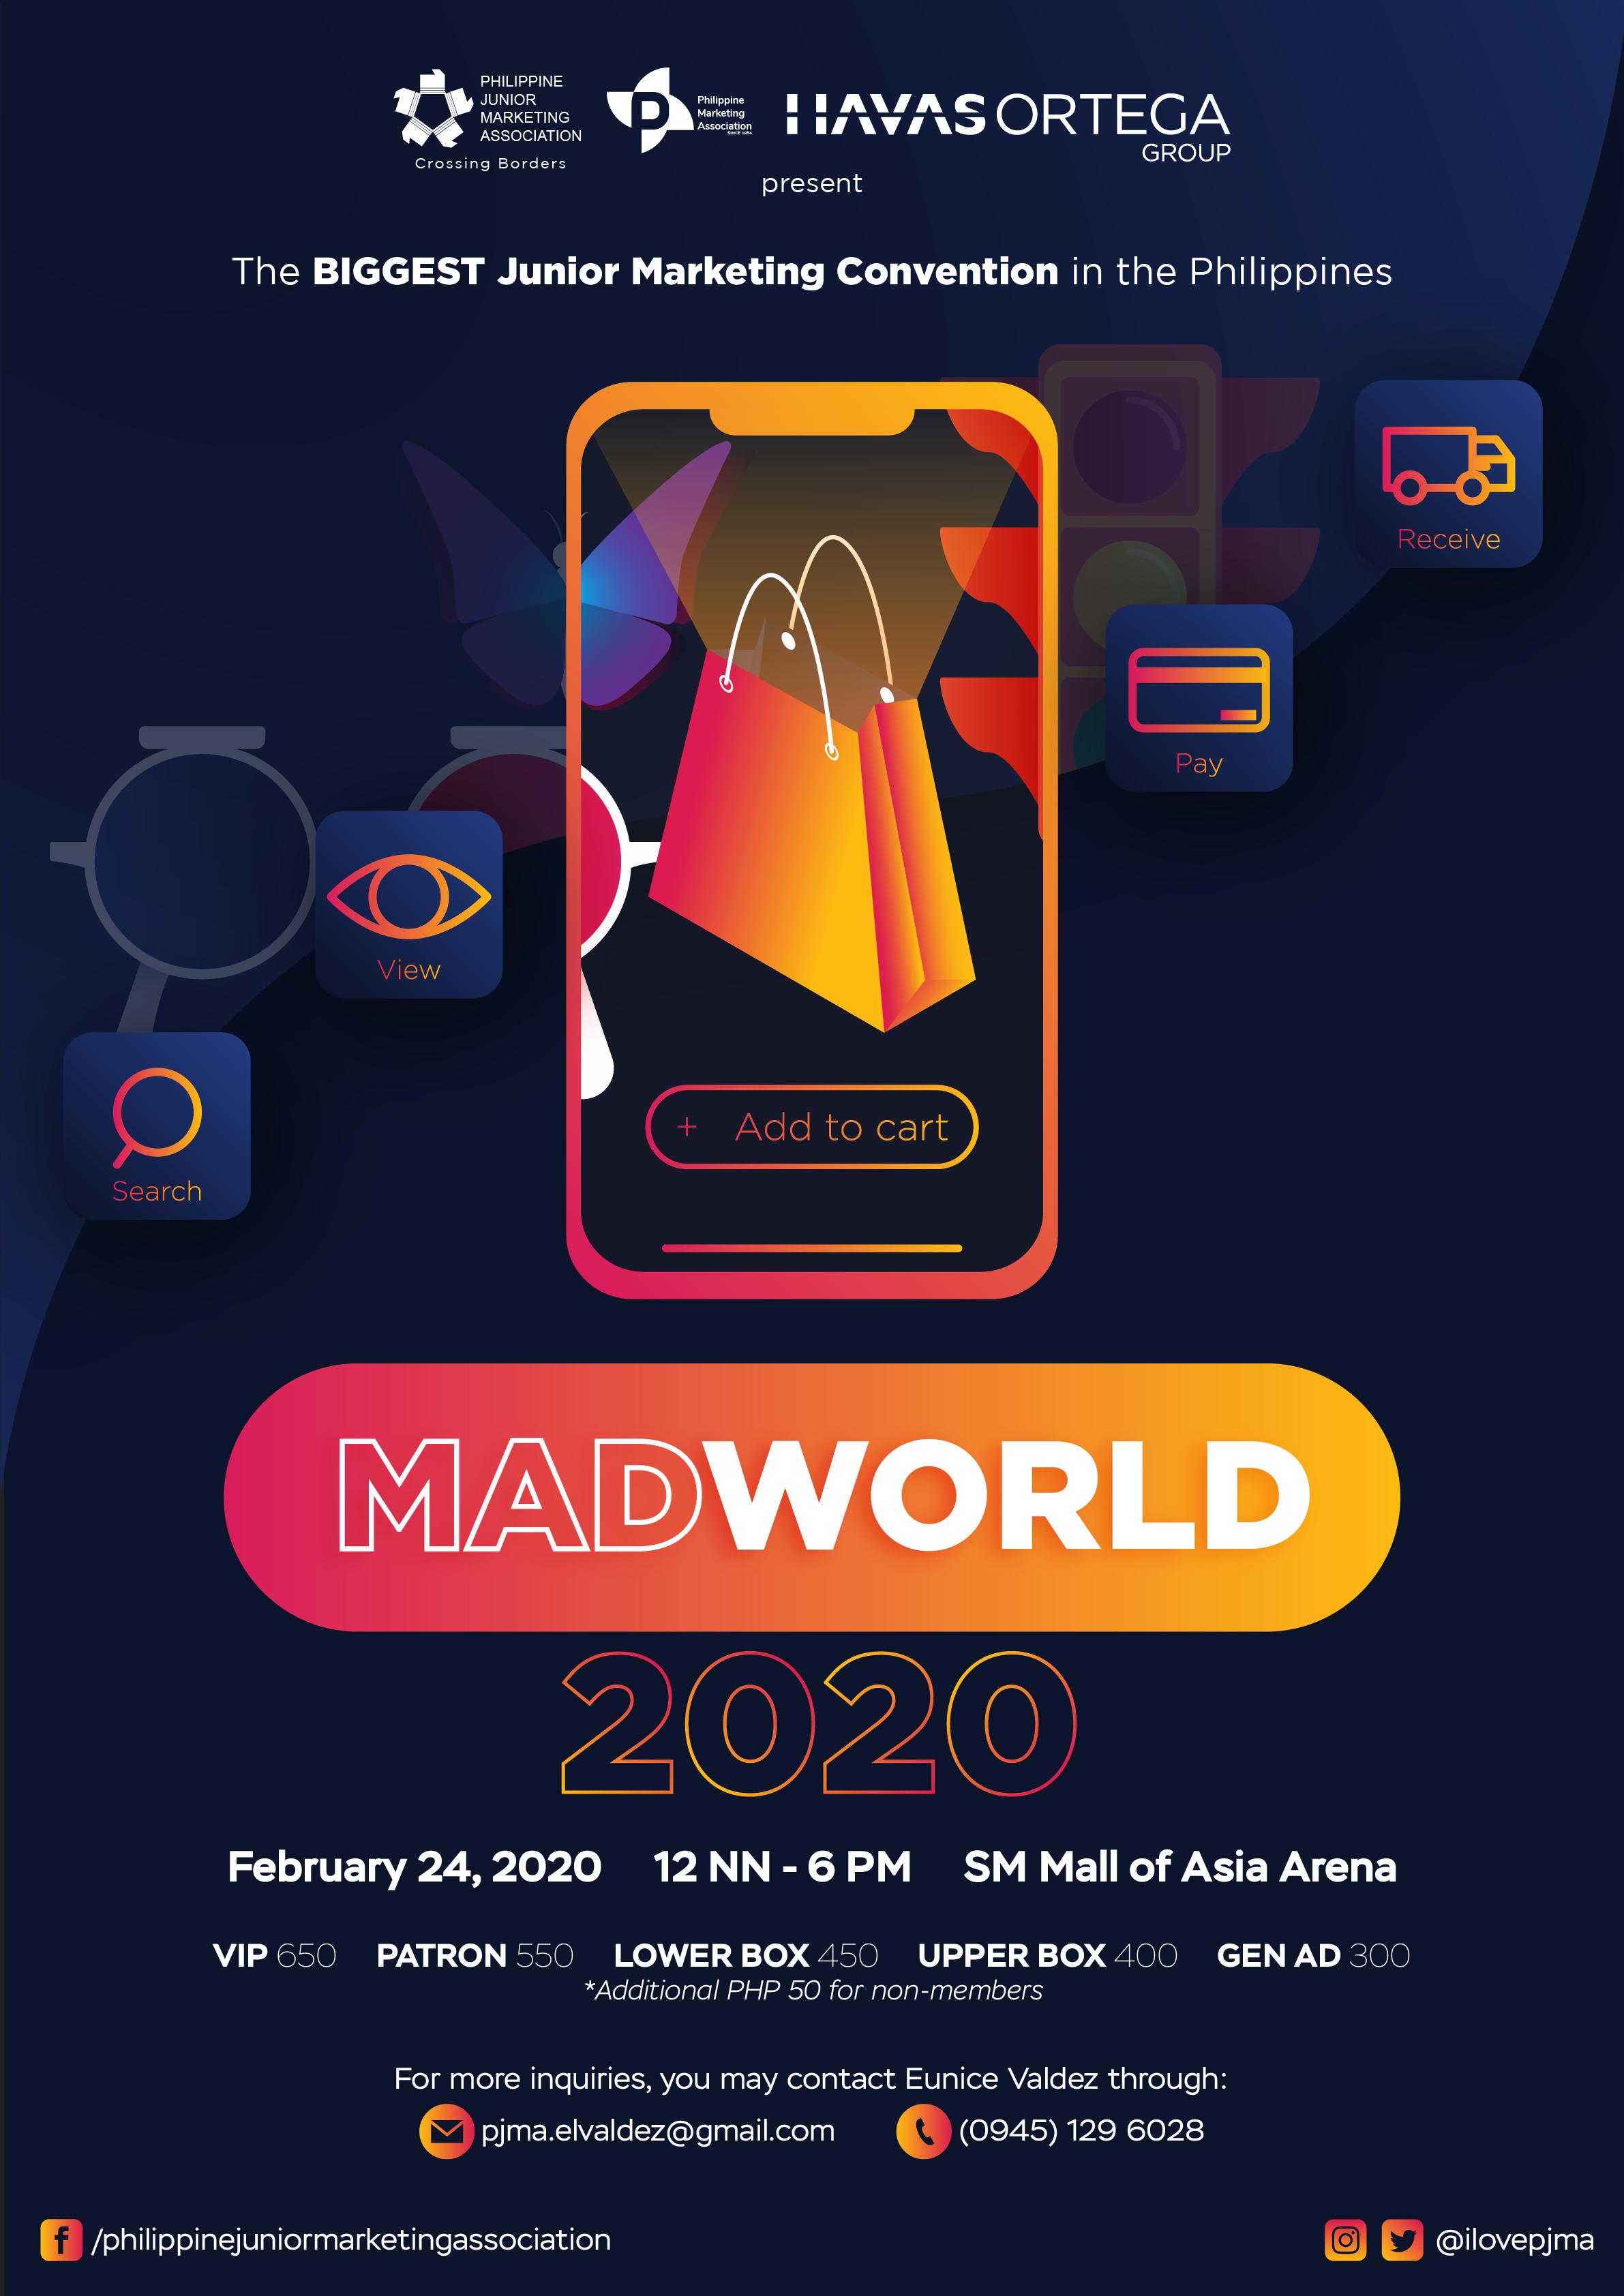 Philippine Junior Marketing Association (PJMA) gears up for MADWORLD 2020